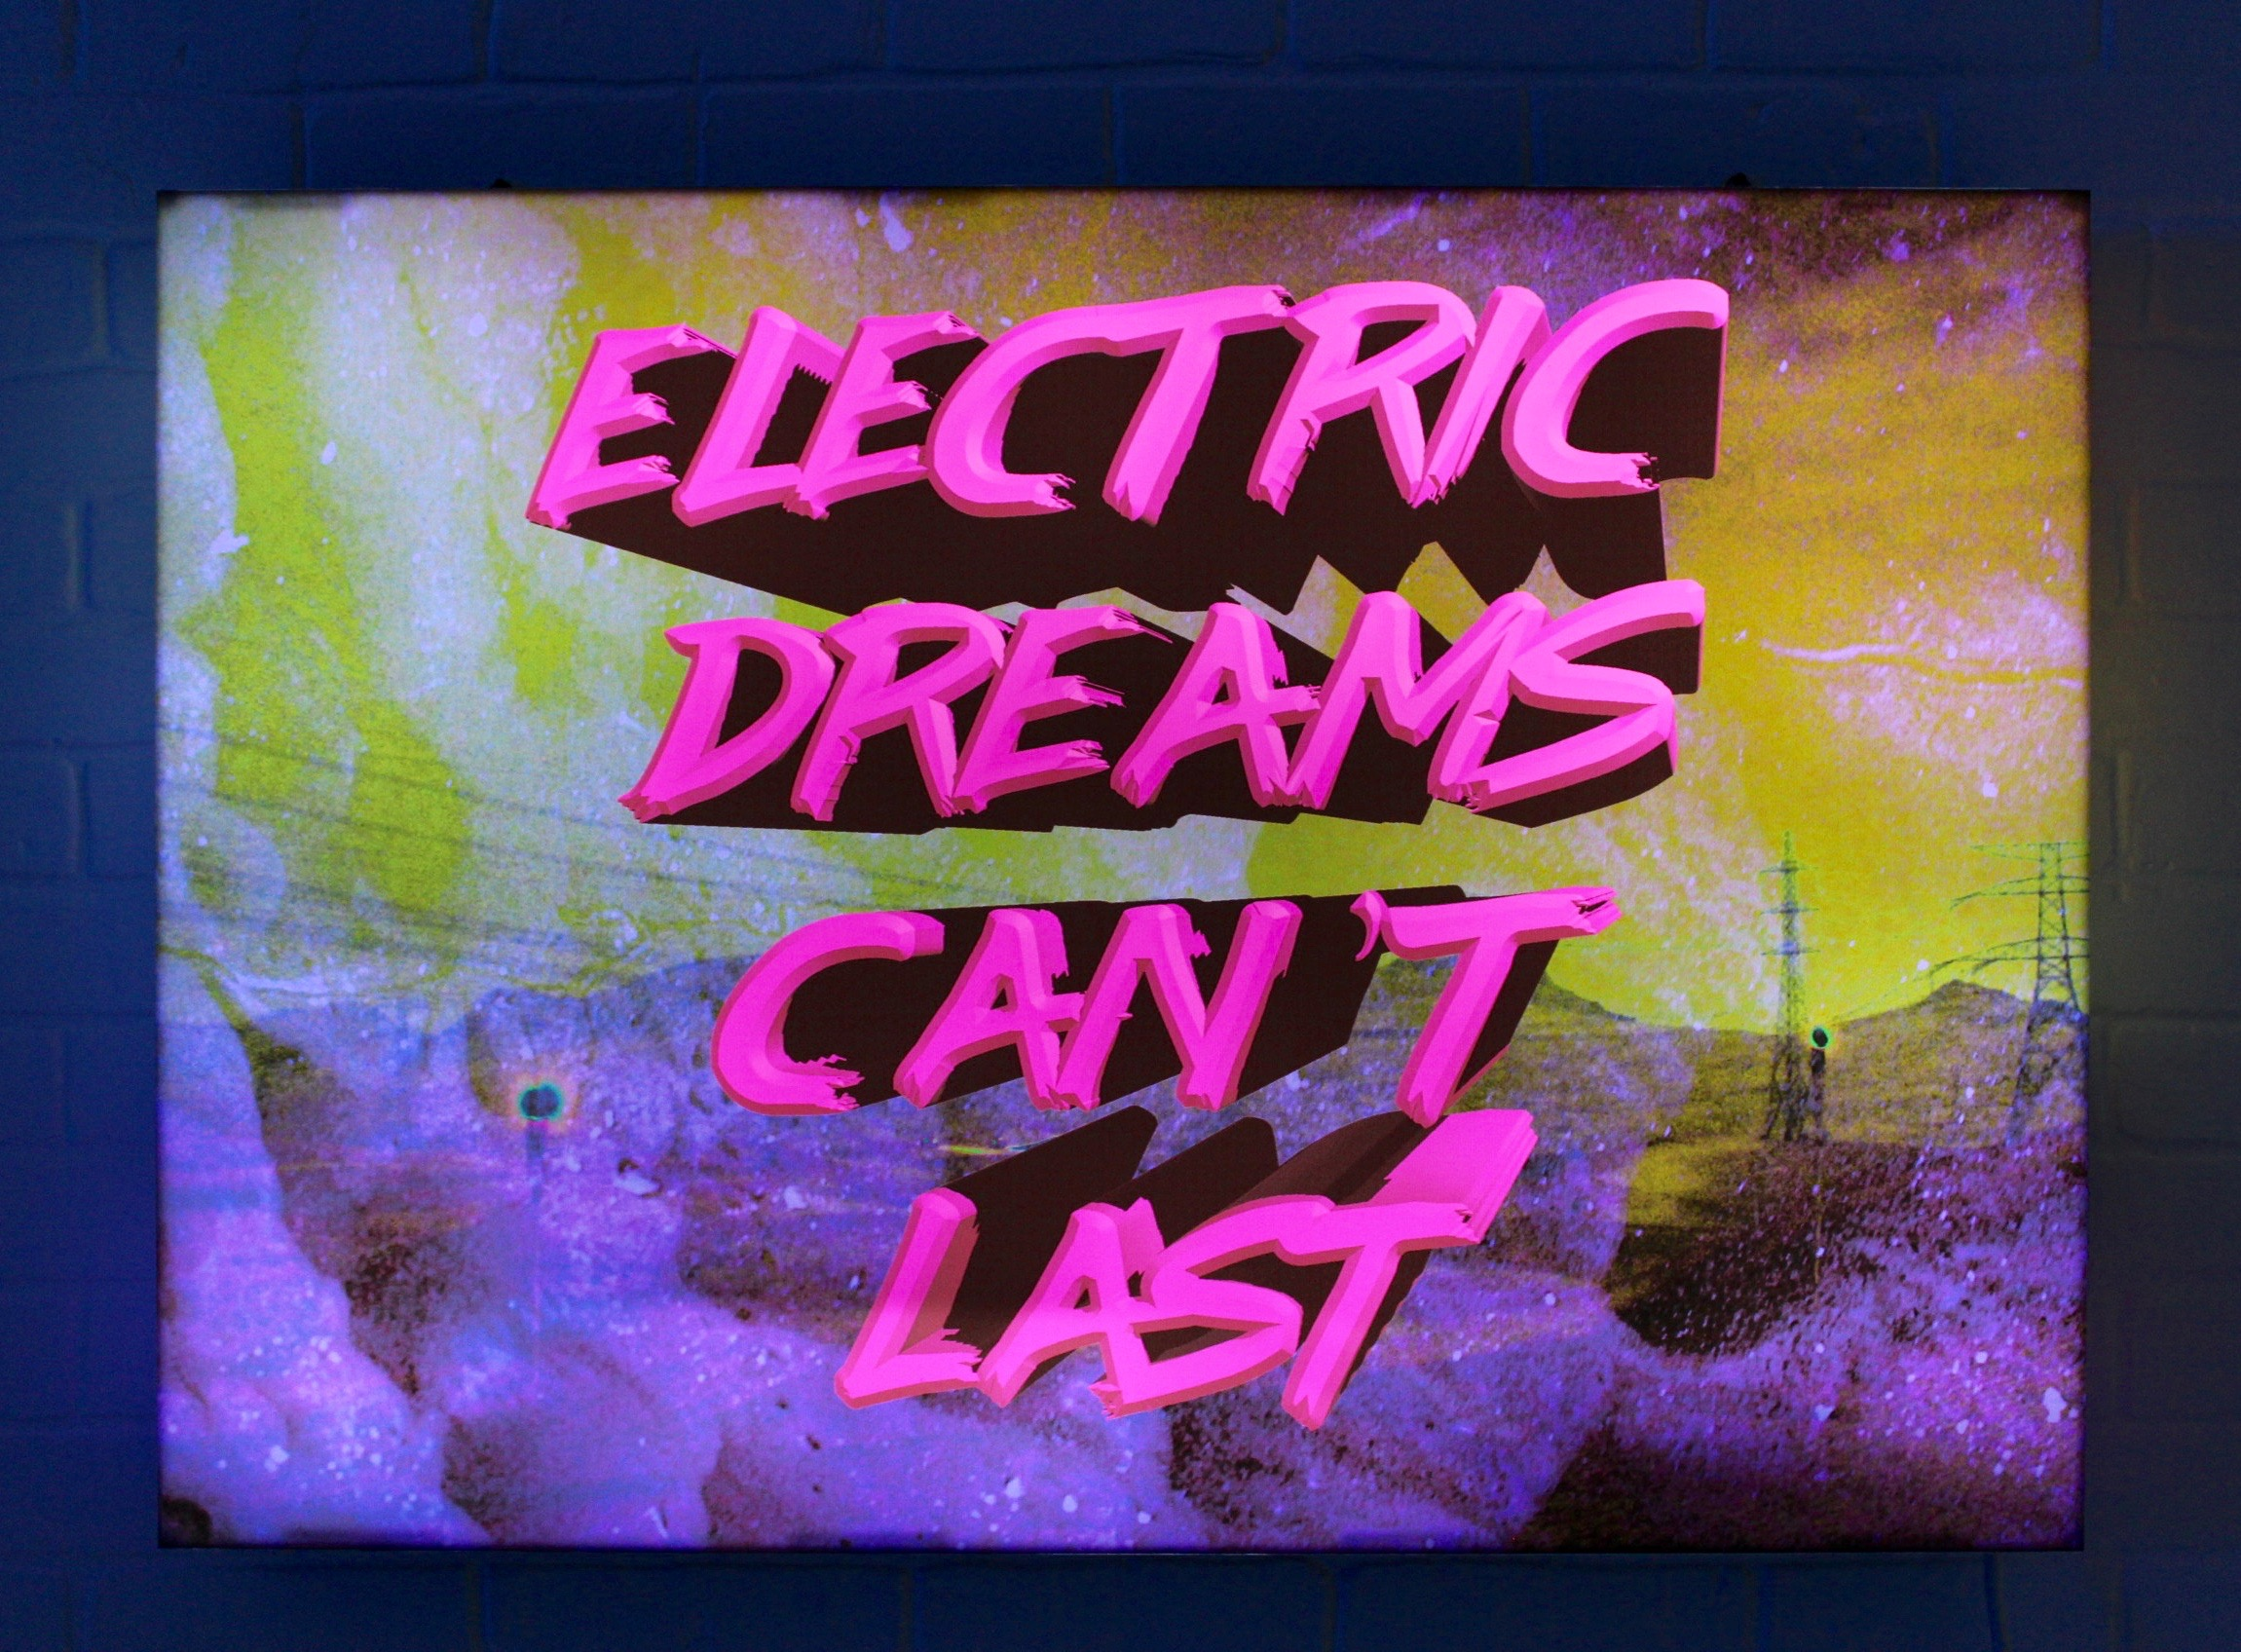 Electric Dreams Can't Last (60 x 90 cm).jpg